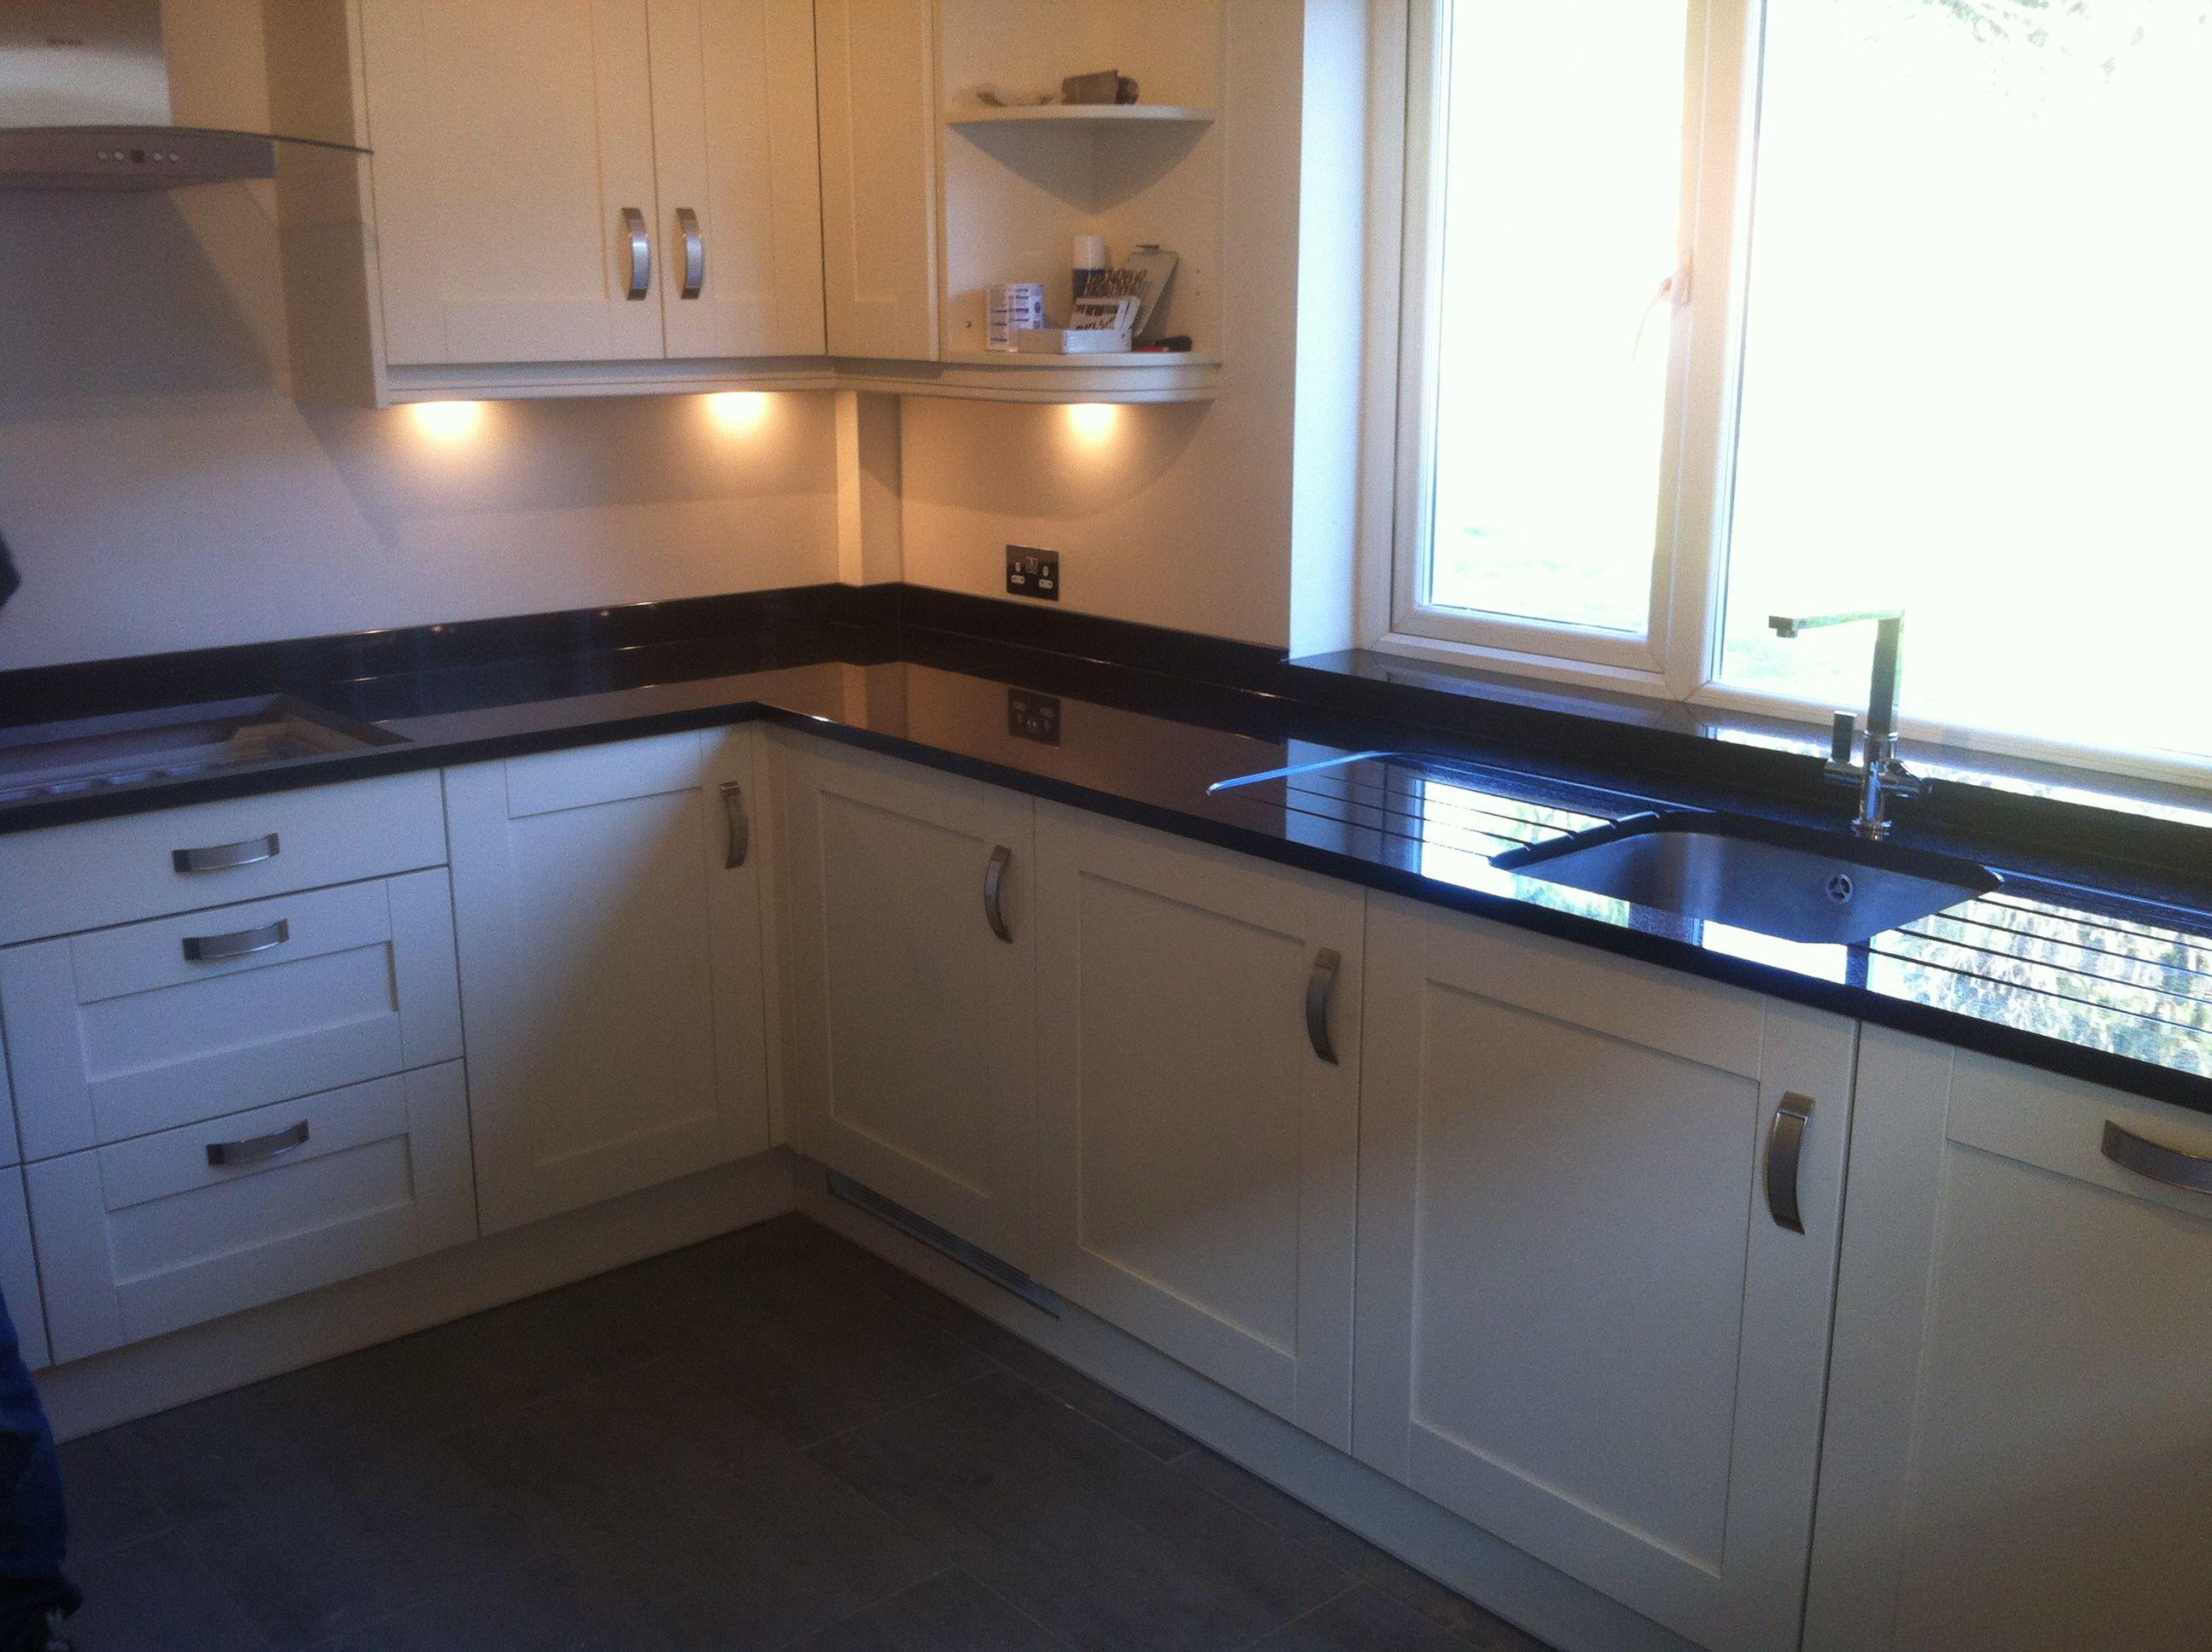 Star Galaxy Granite Kitchen Worktop Granit Kuche Kuche Haus